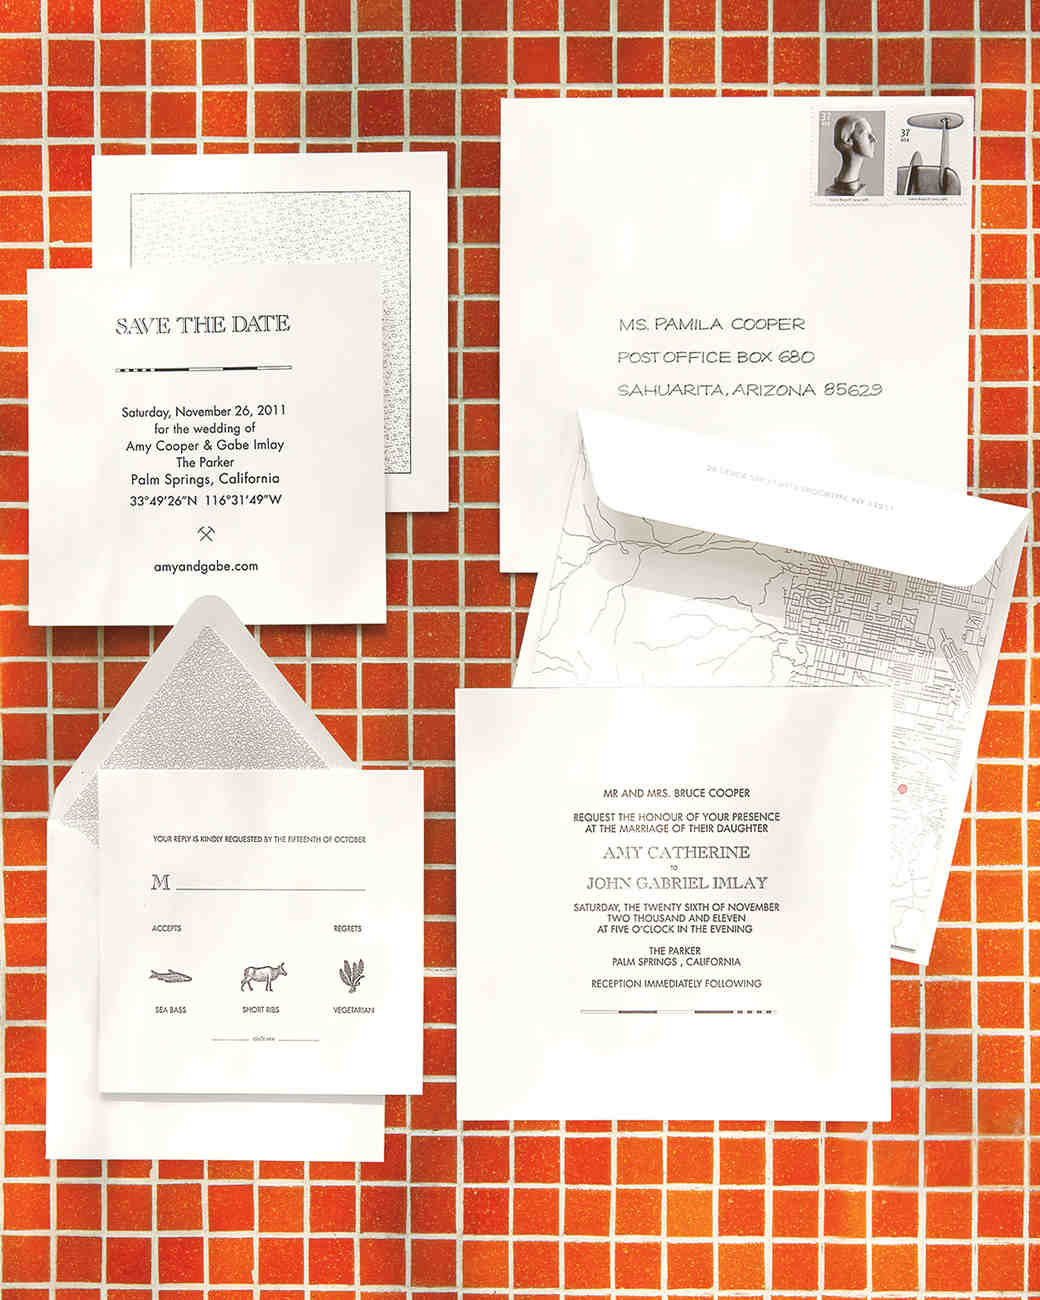 gabe-amy-invitation3-002-mwd108251.jpg